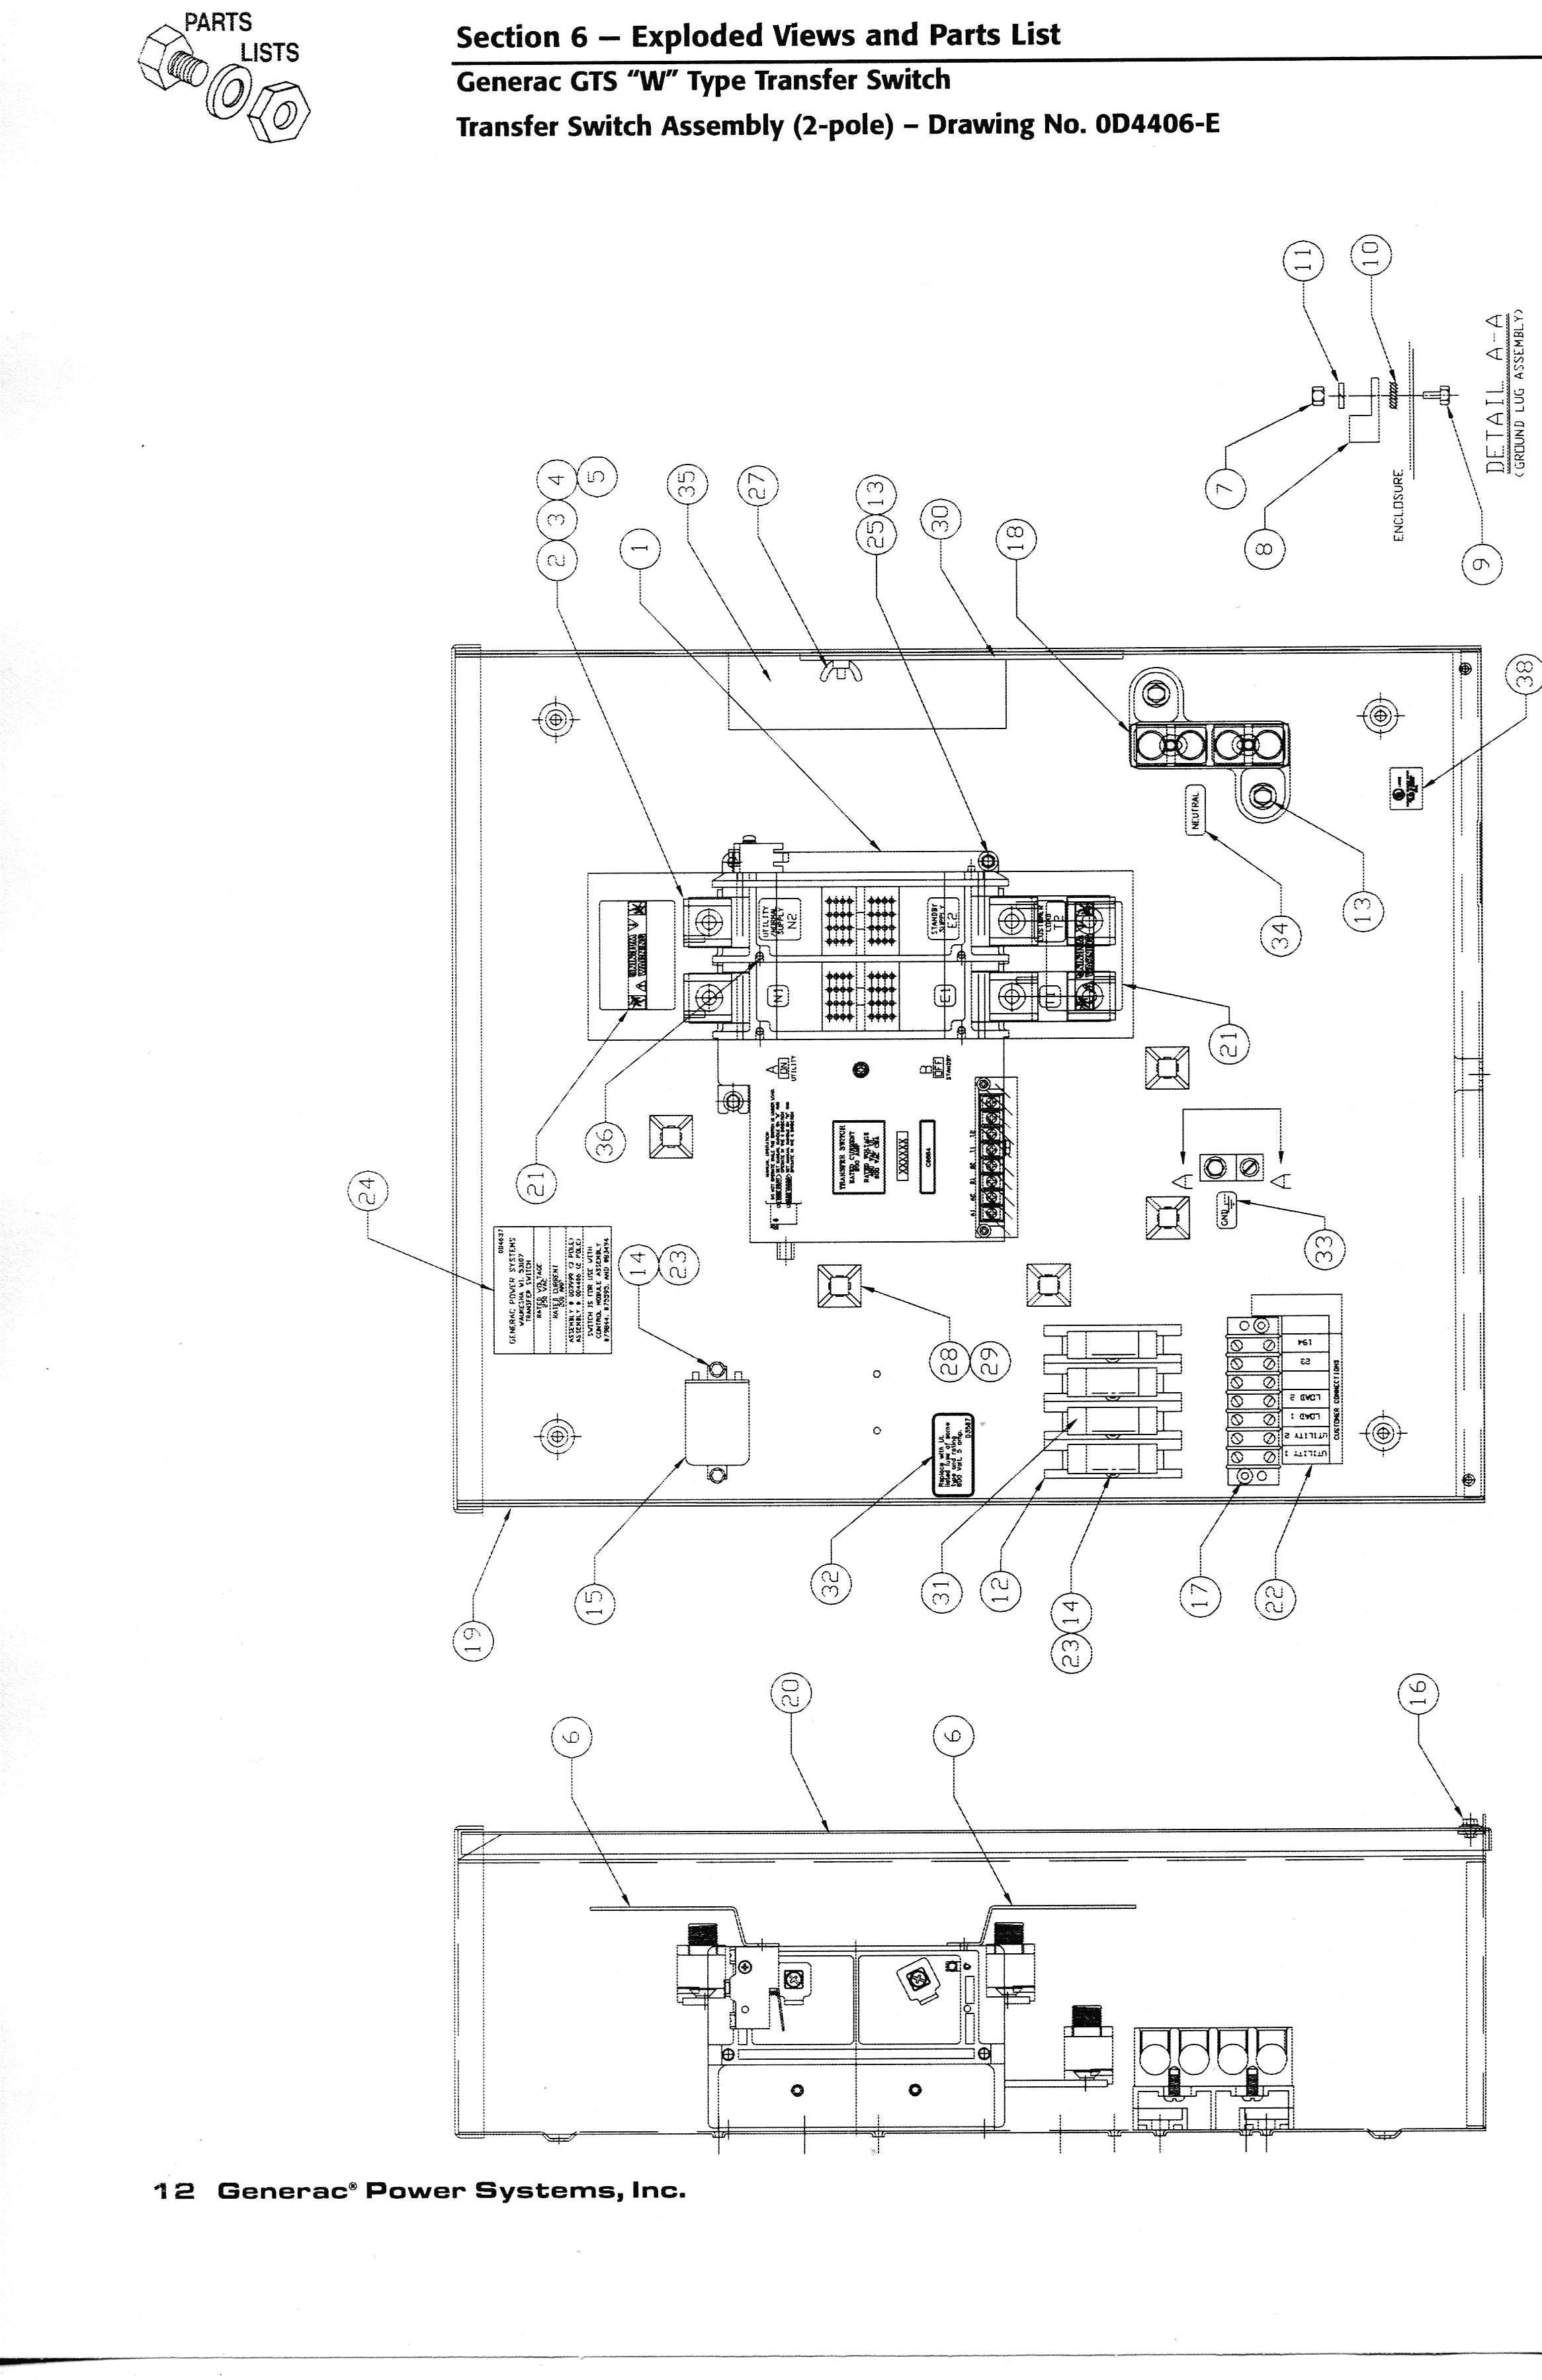 Generac Nexus Switch Wiring | Manual E-Books - Generac 200 Amp Transfer Switch Wiring Diagram